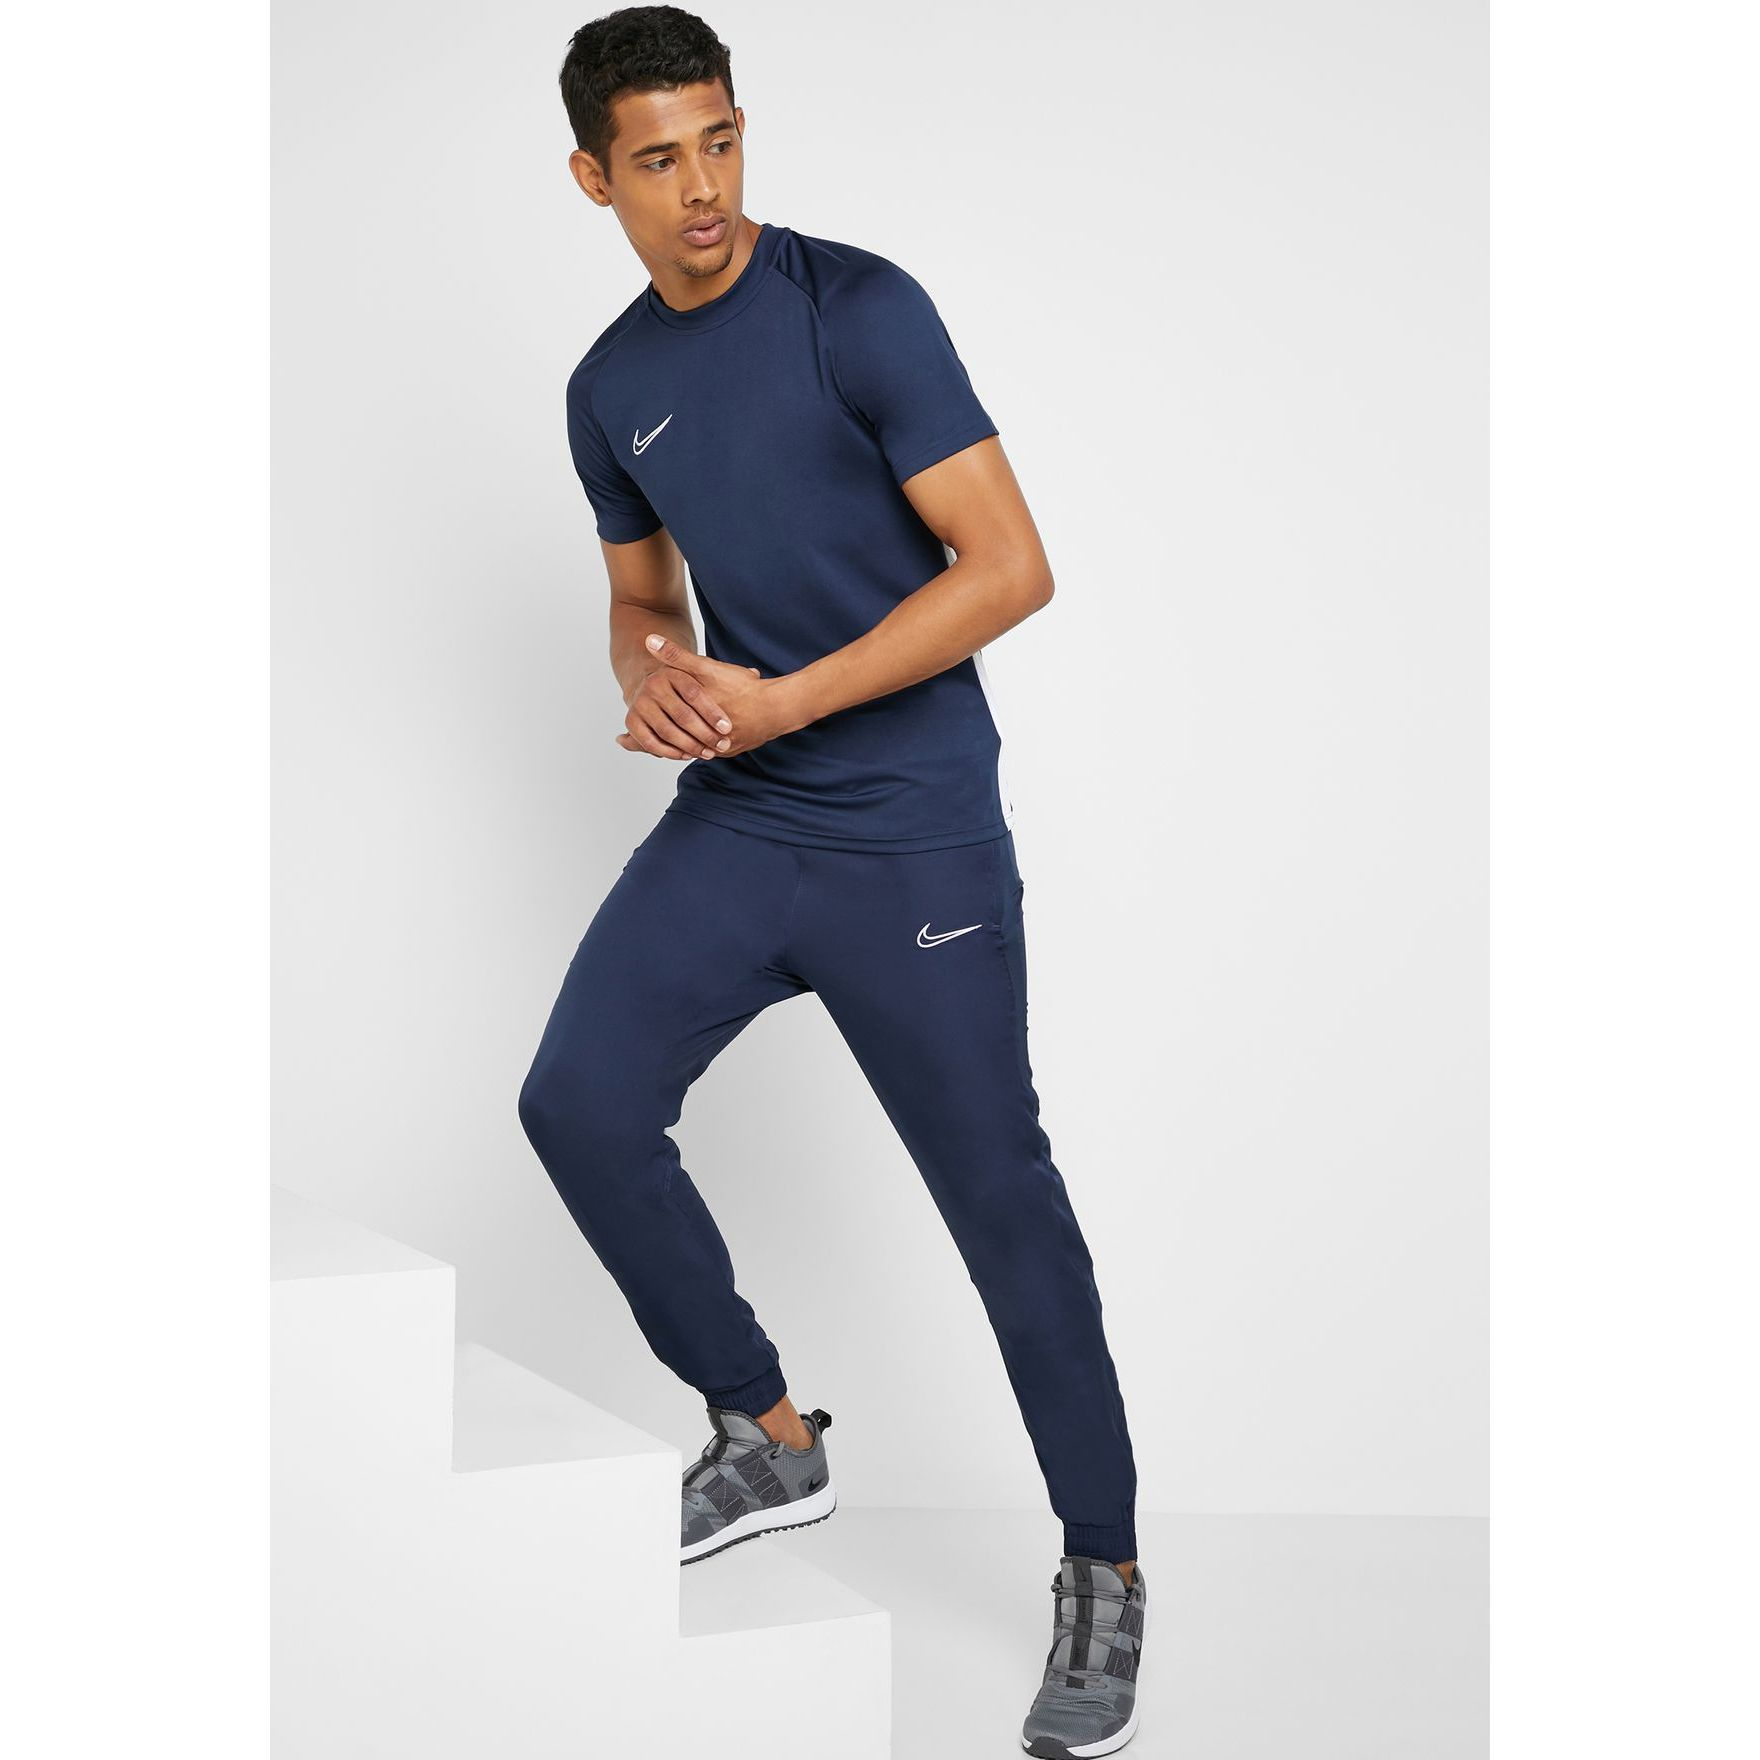 jefe Disfraces natural  Pantaloni barbati Nike Dri-FIT Academy AR7654-452, L INTL, Bleumarin -  eMAG.ro